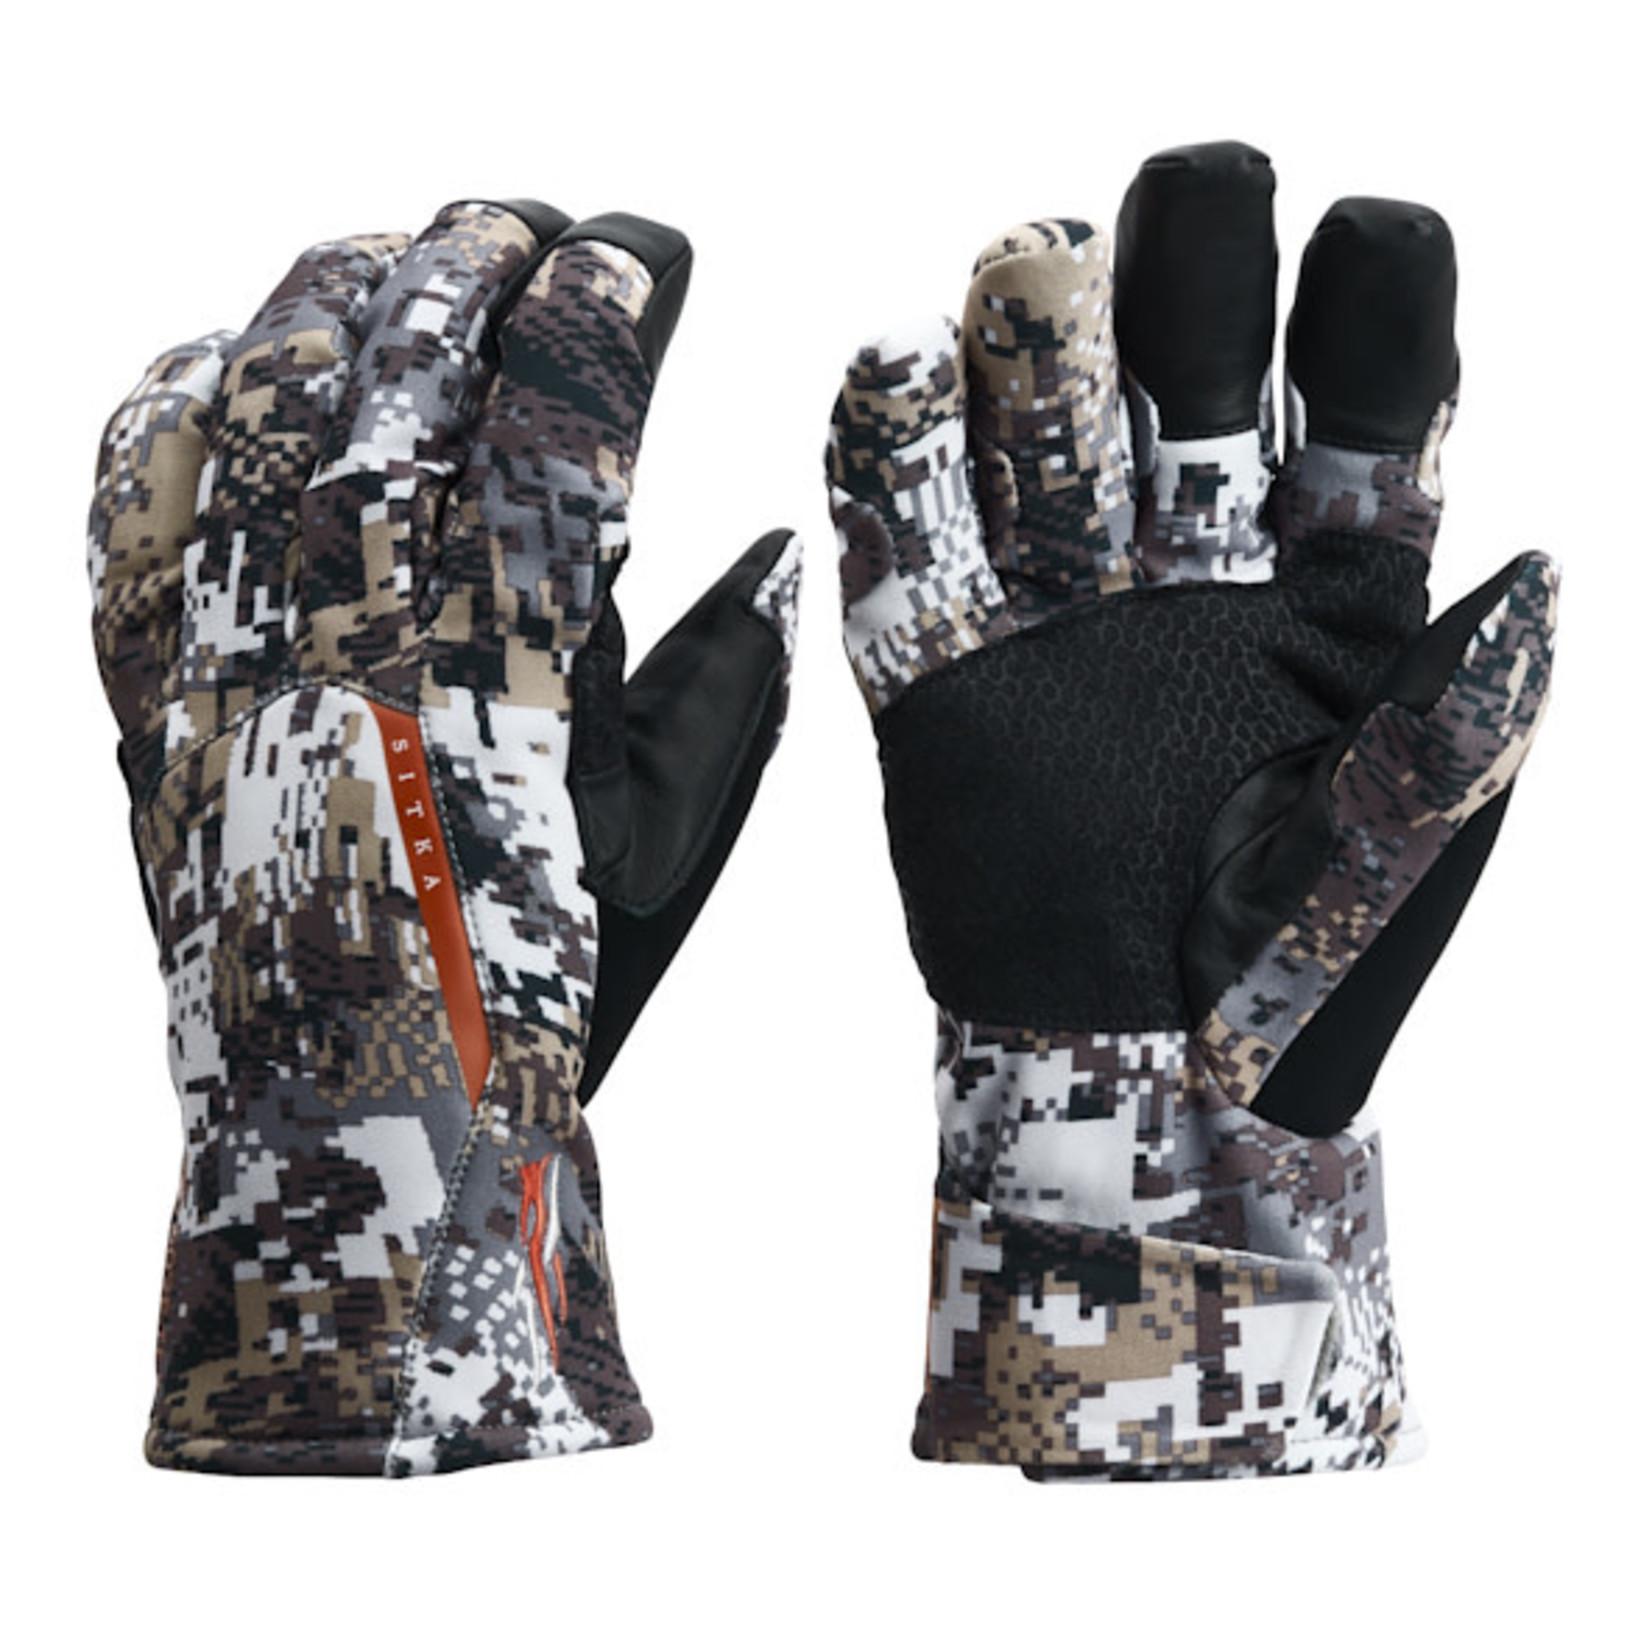 Sitka Downpour GTX Glove